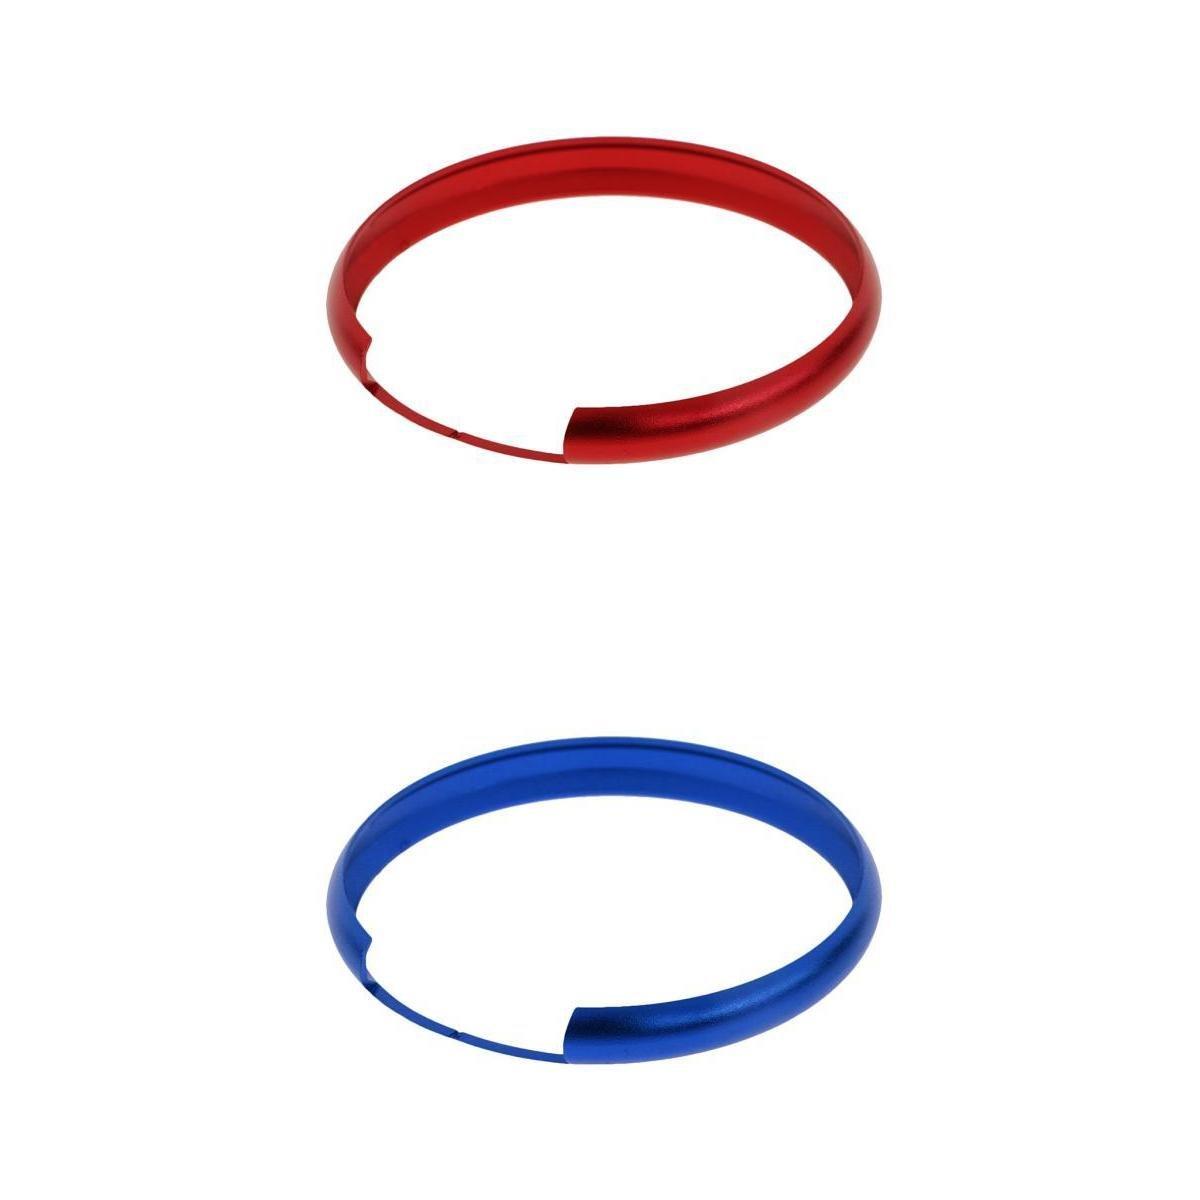 Gazechimp 2x Cubierta Anillo de FOB Protectora de Llave Remoto 45cm de Aluminio para BMW Mini Cooper #Rojo Azul